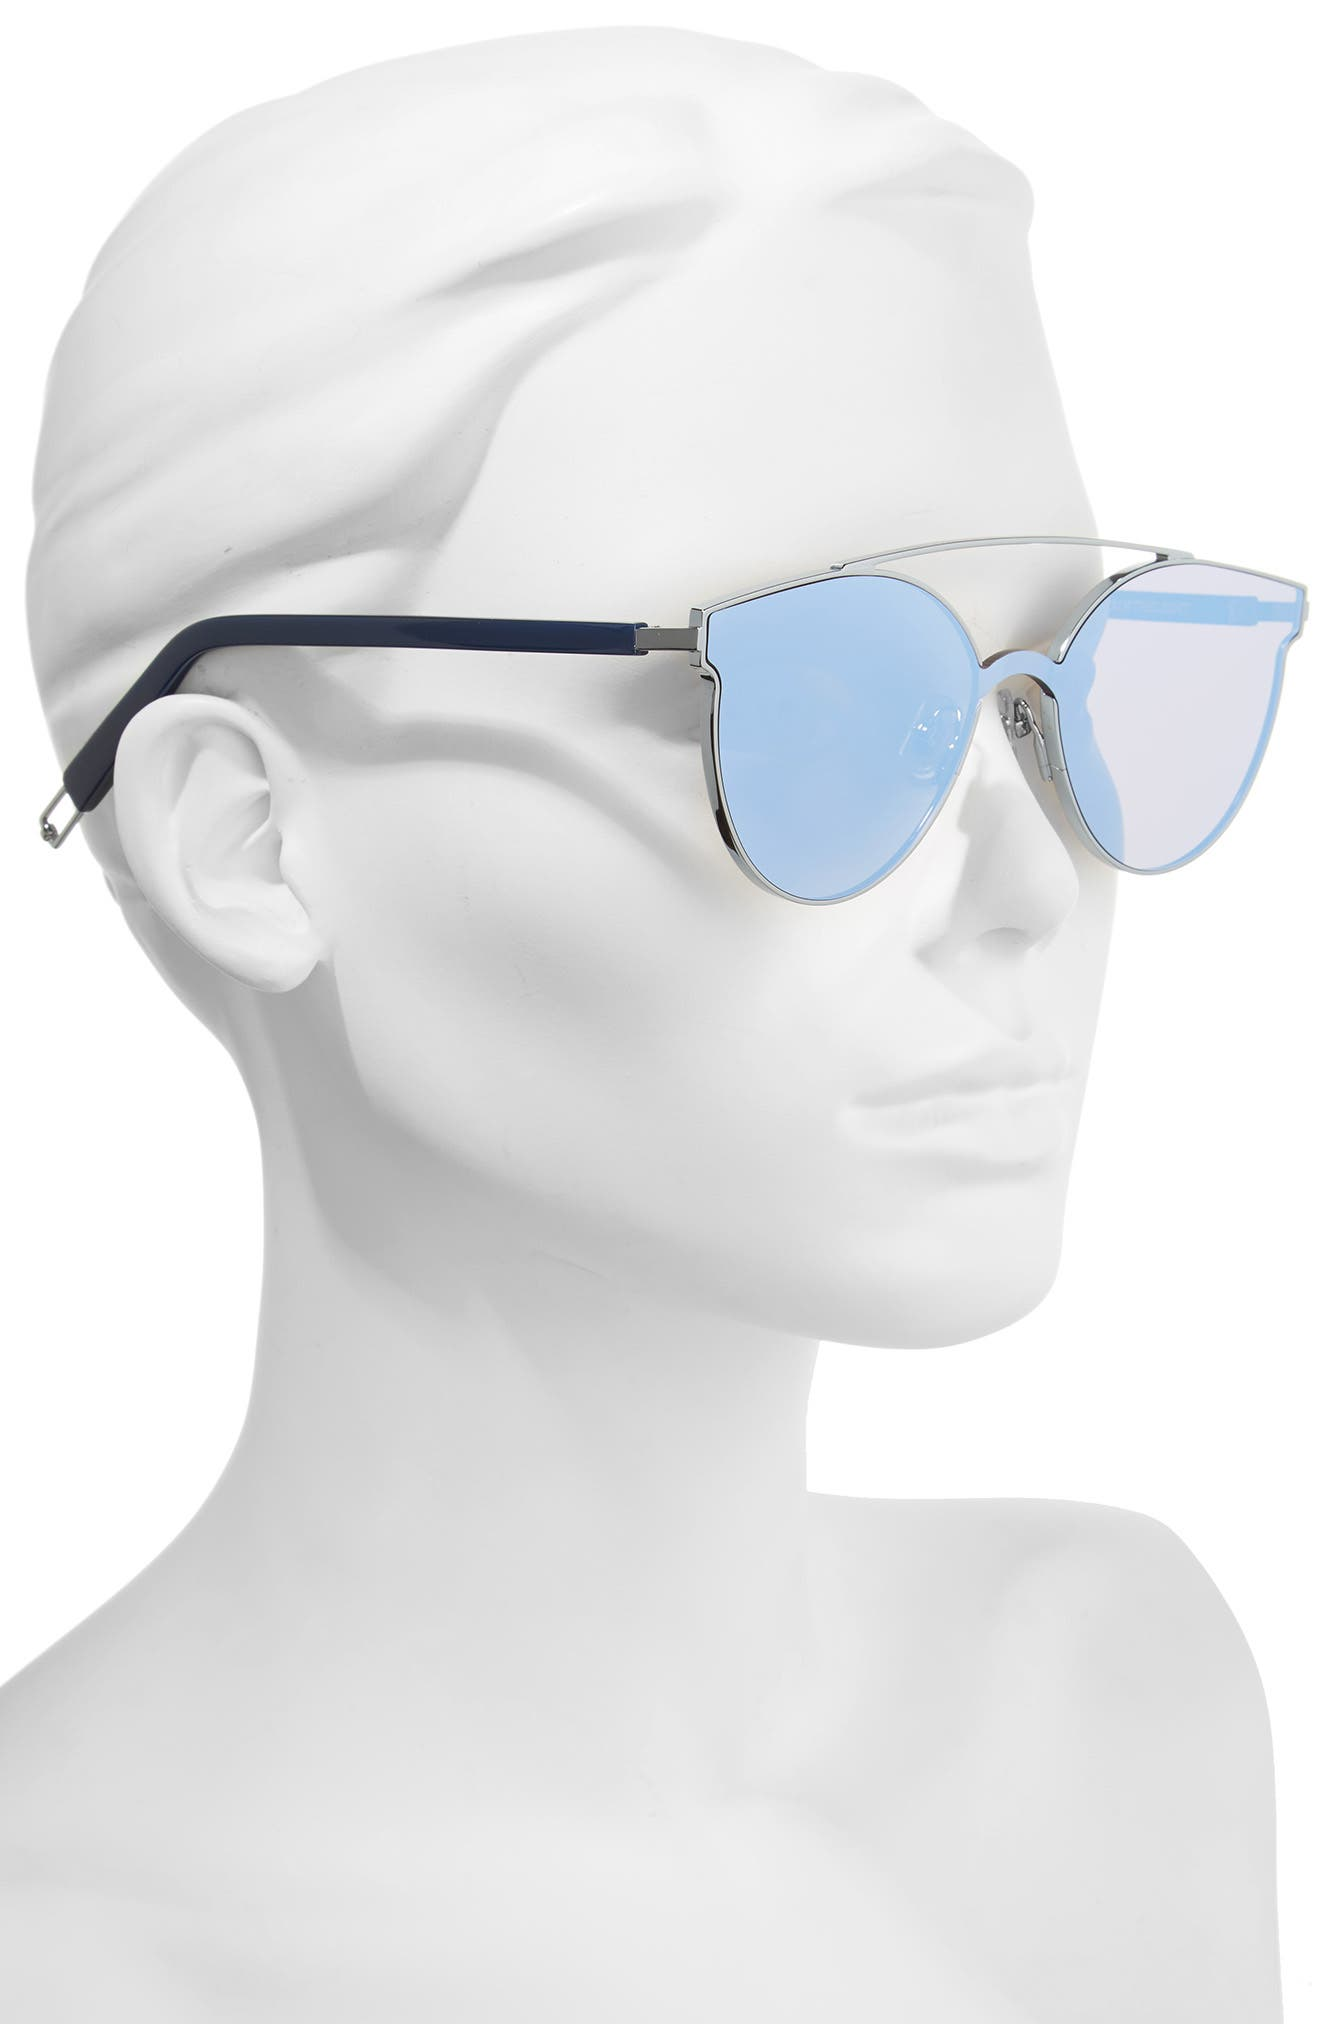 Tilda Swinton x Gentle Monster Trick of the Light 60mm Shield Sunglasses,                             Alternate thumbnail 2, color,                             Blue Mirror